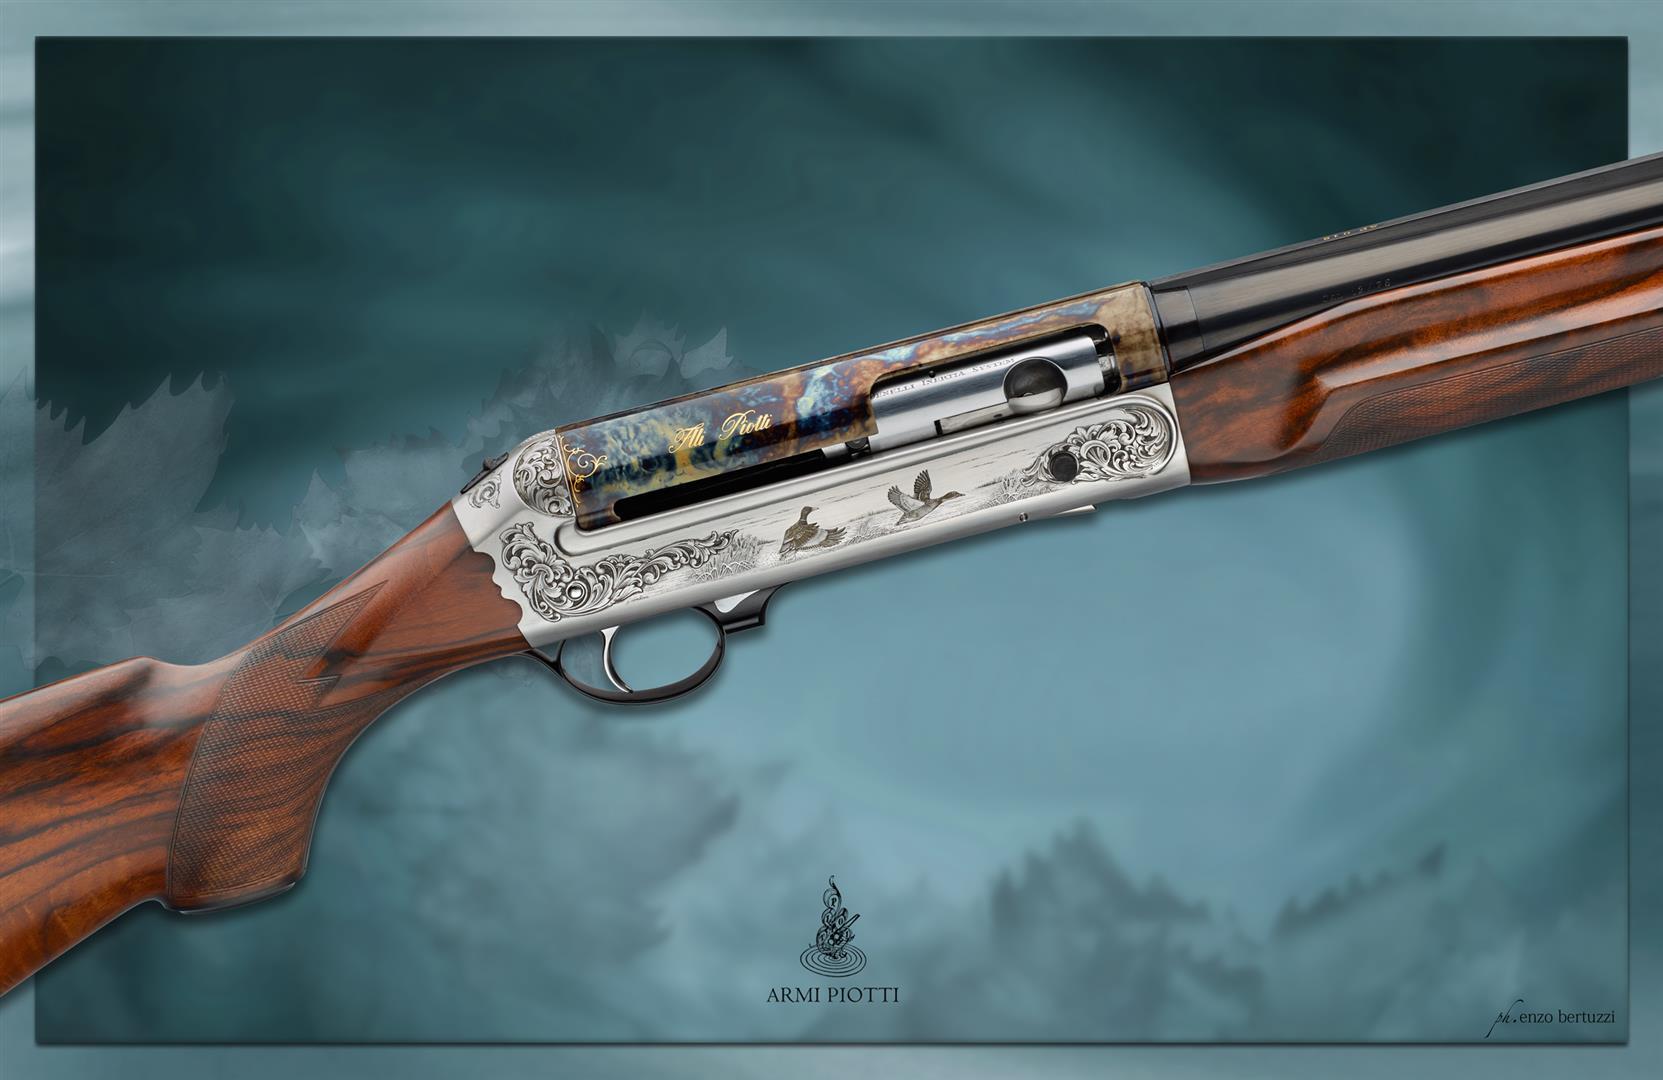 Piotti Benelli shotgun tartarugato color case hardening